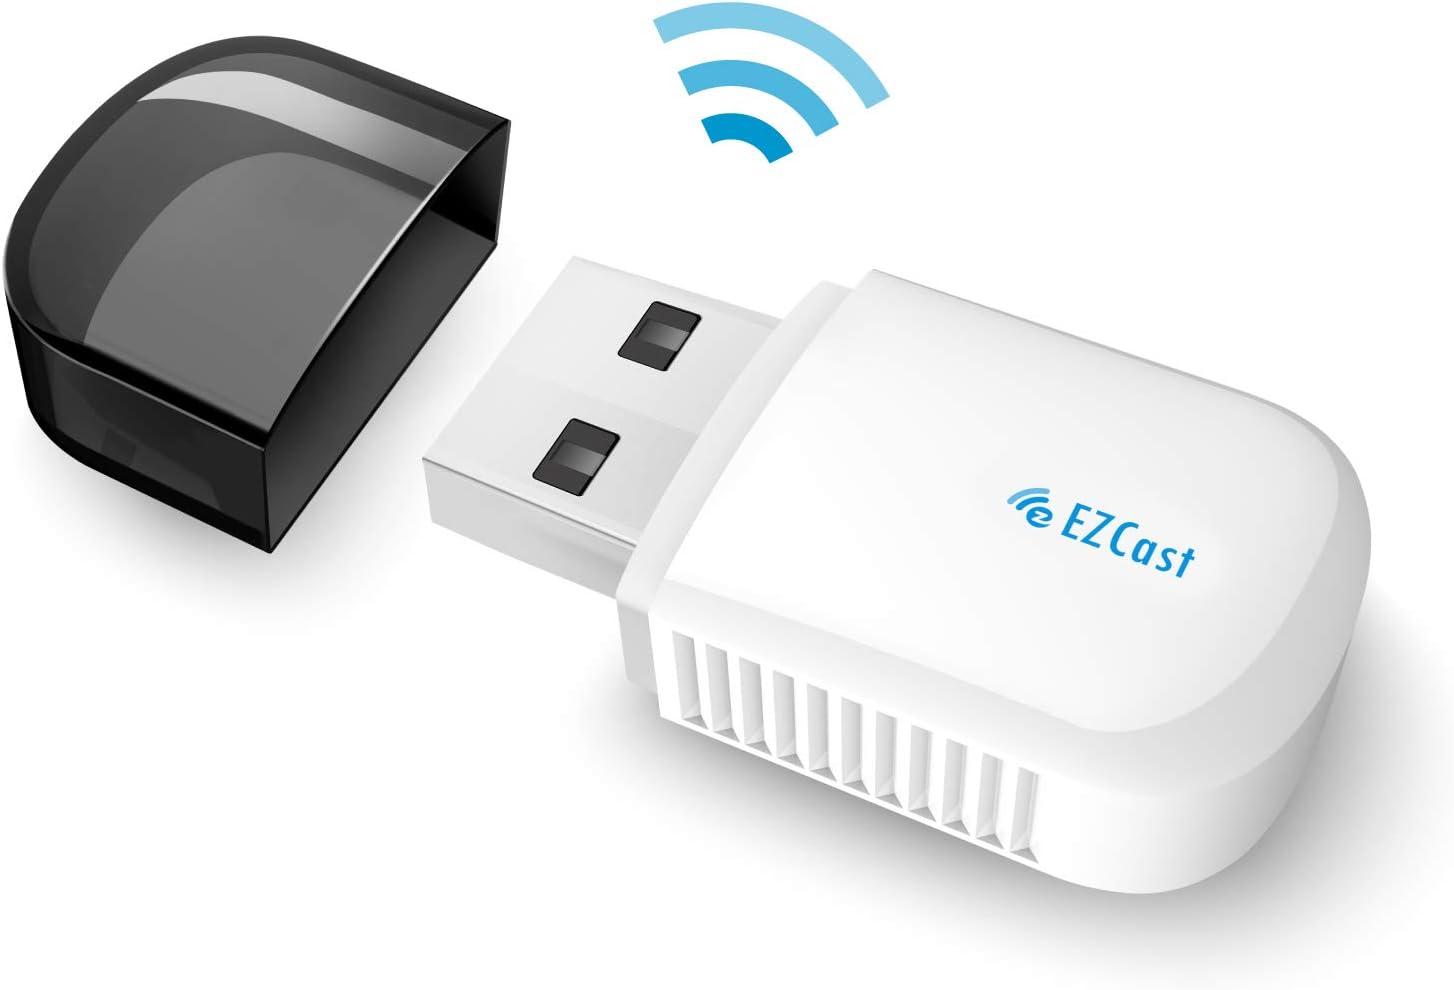 Adaptador WiFi USB EZCAST para PC/escritorio/portátil,alta velocidad AC600, WiFi de banda dual de 2,4GHz/5GHz, Bluetooth, MU-MIMO, Windows XP/7/8/8.1/10 y macOS